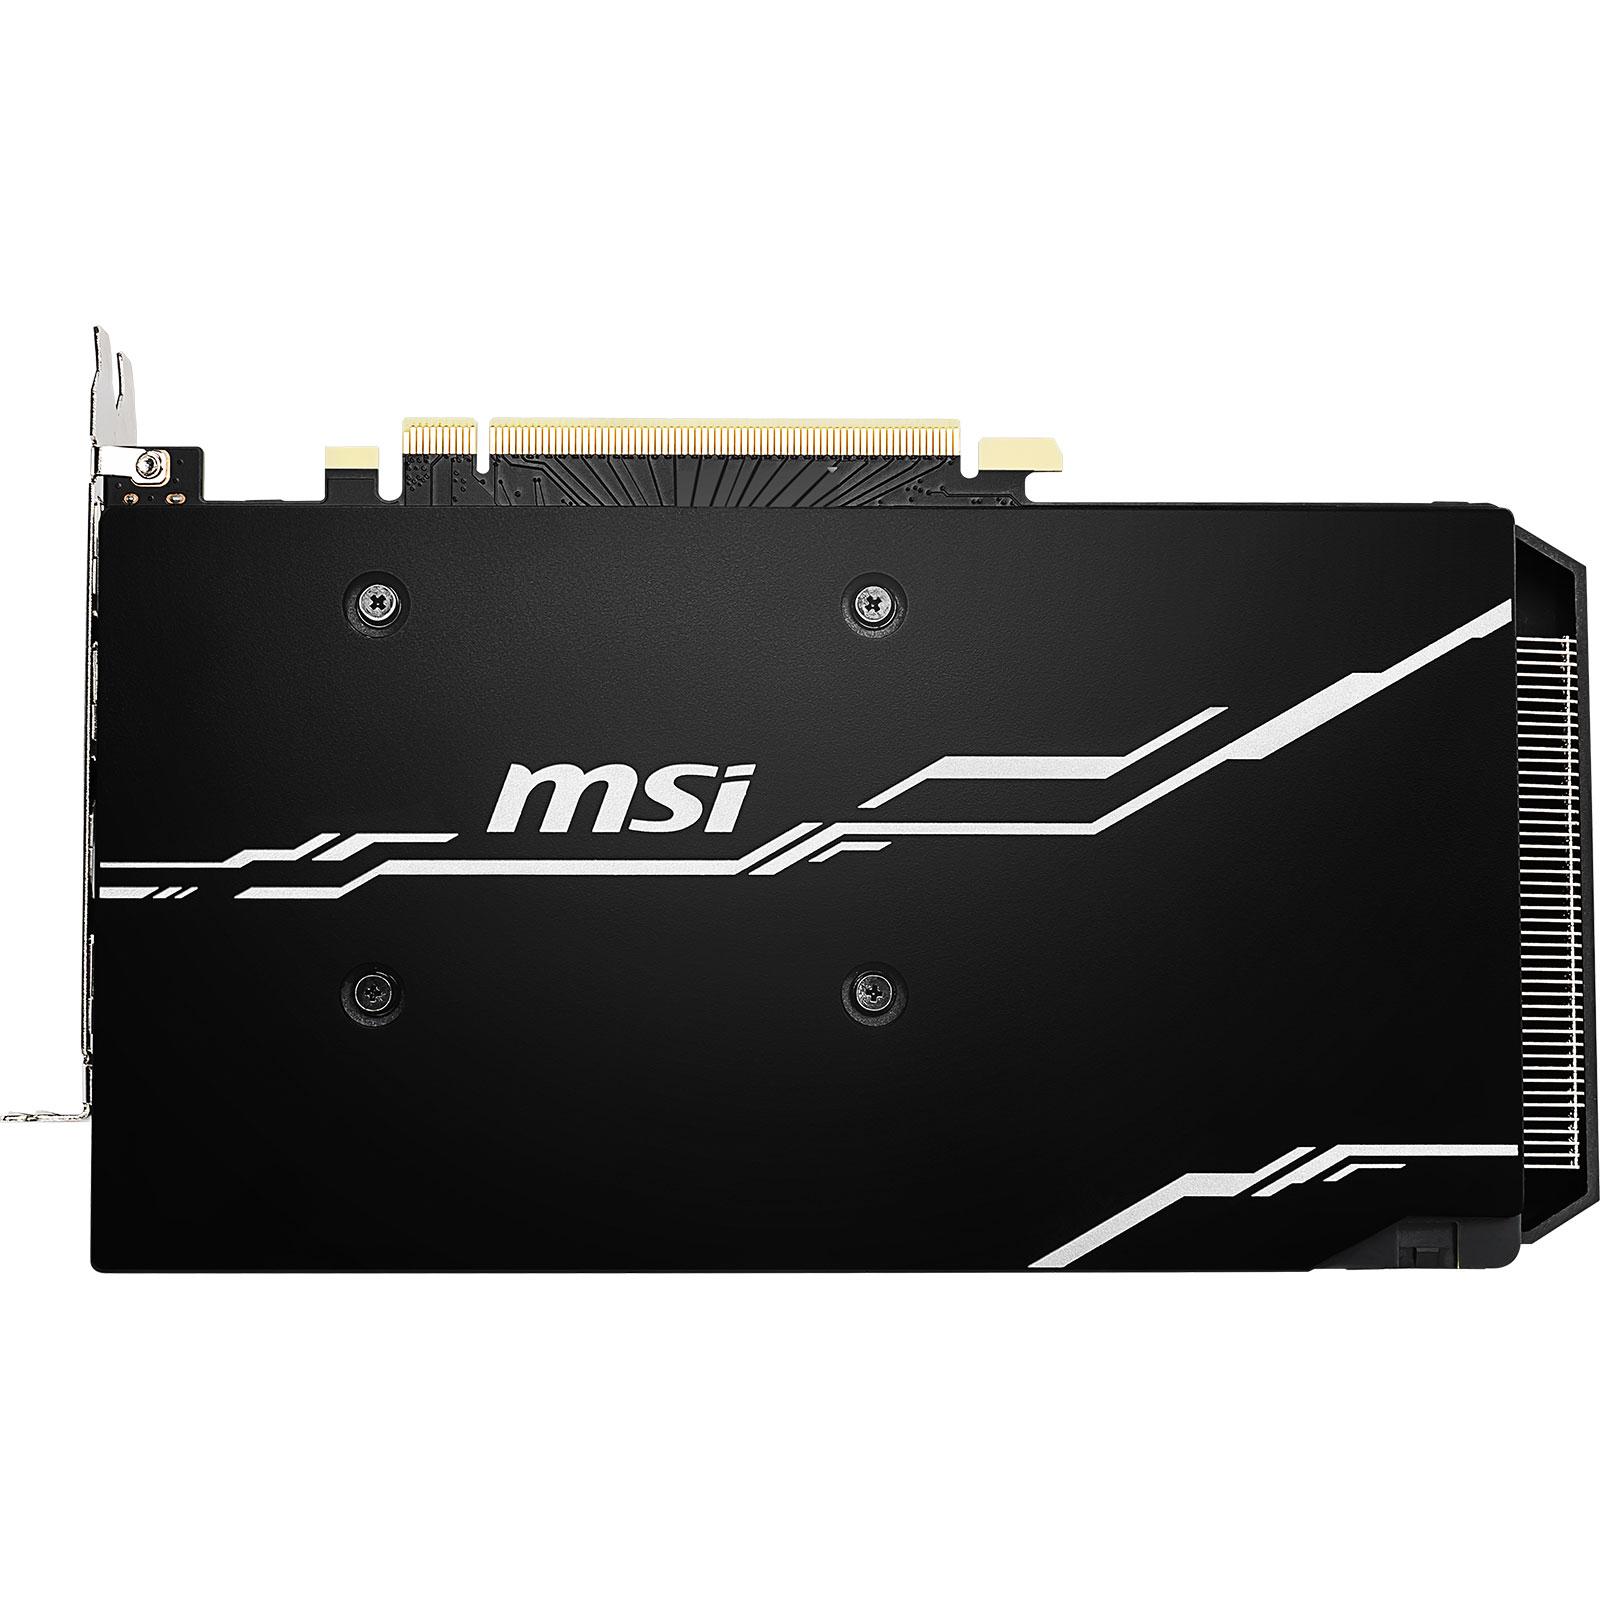 MSI RTX 2070 VENTUS 8G 8Go - Carte graphique MSI - Cybertek.fr - 2